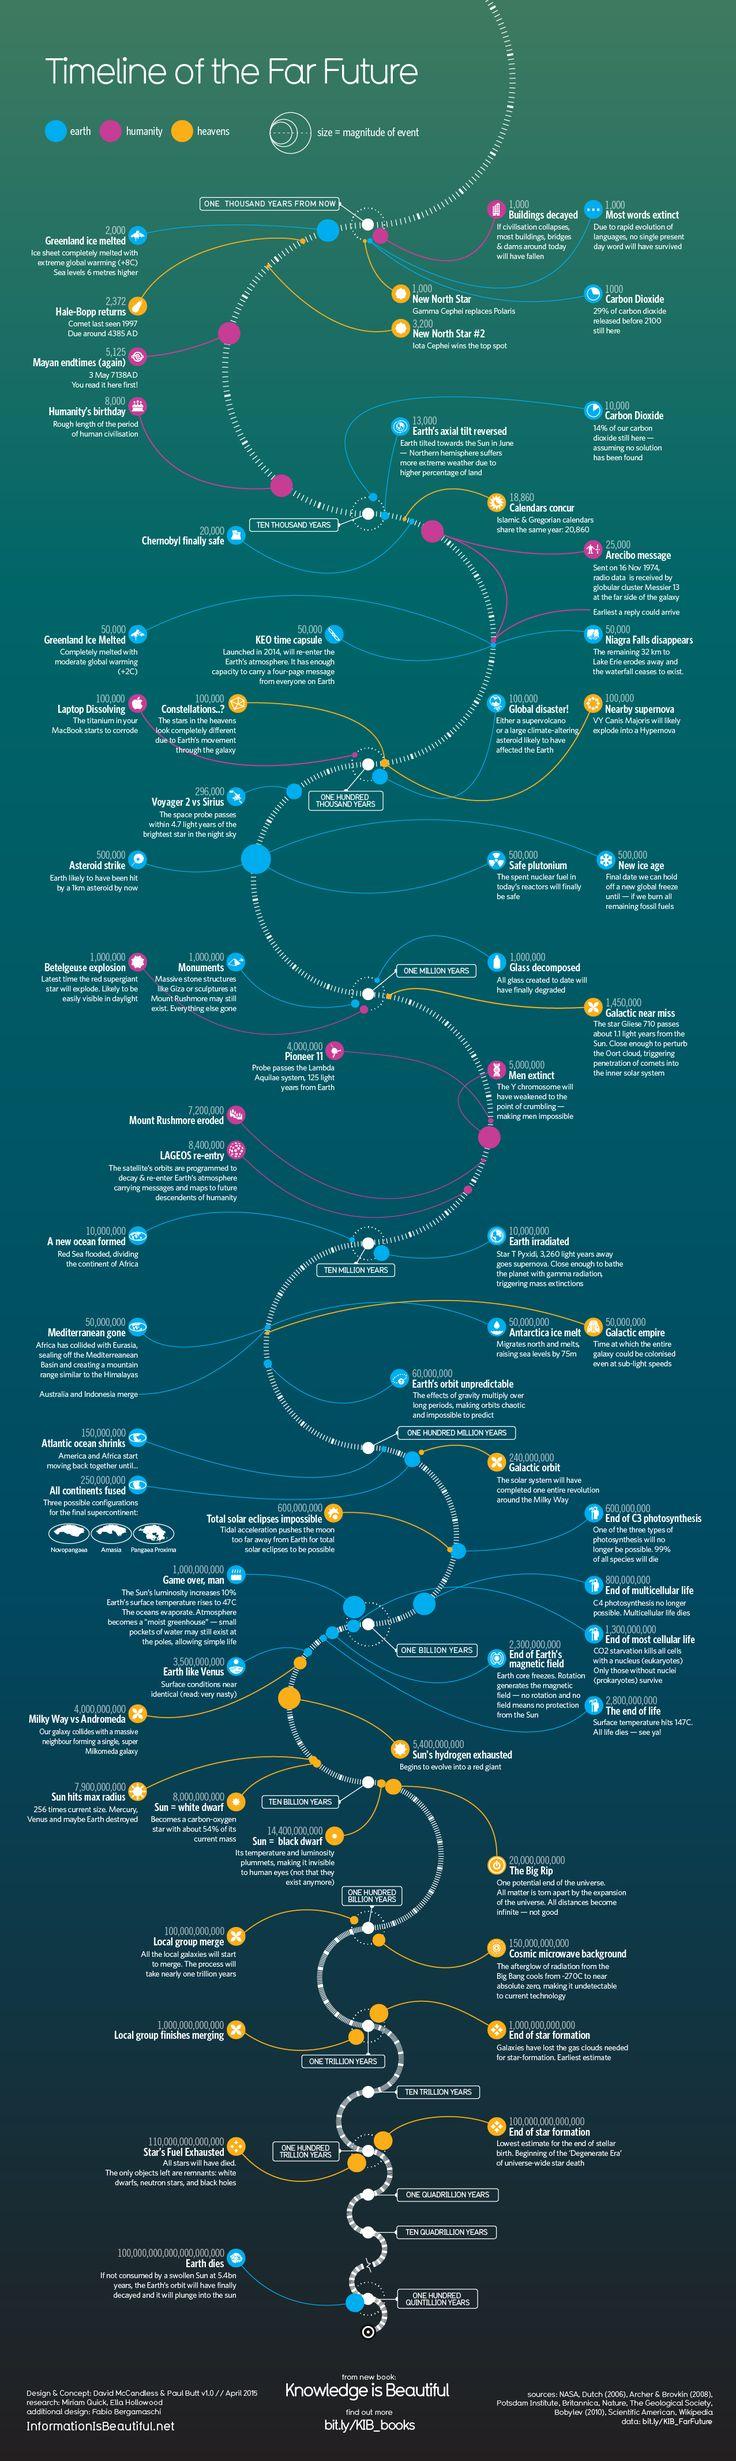 http://www.informationisbeautiful.net/visualizations/timeline-of-the-far-future/